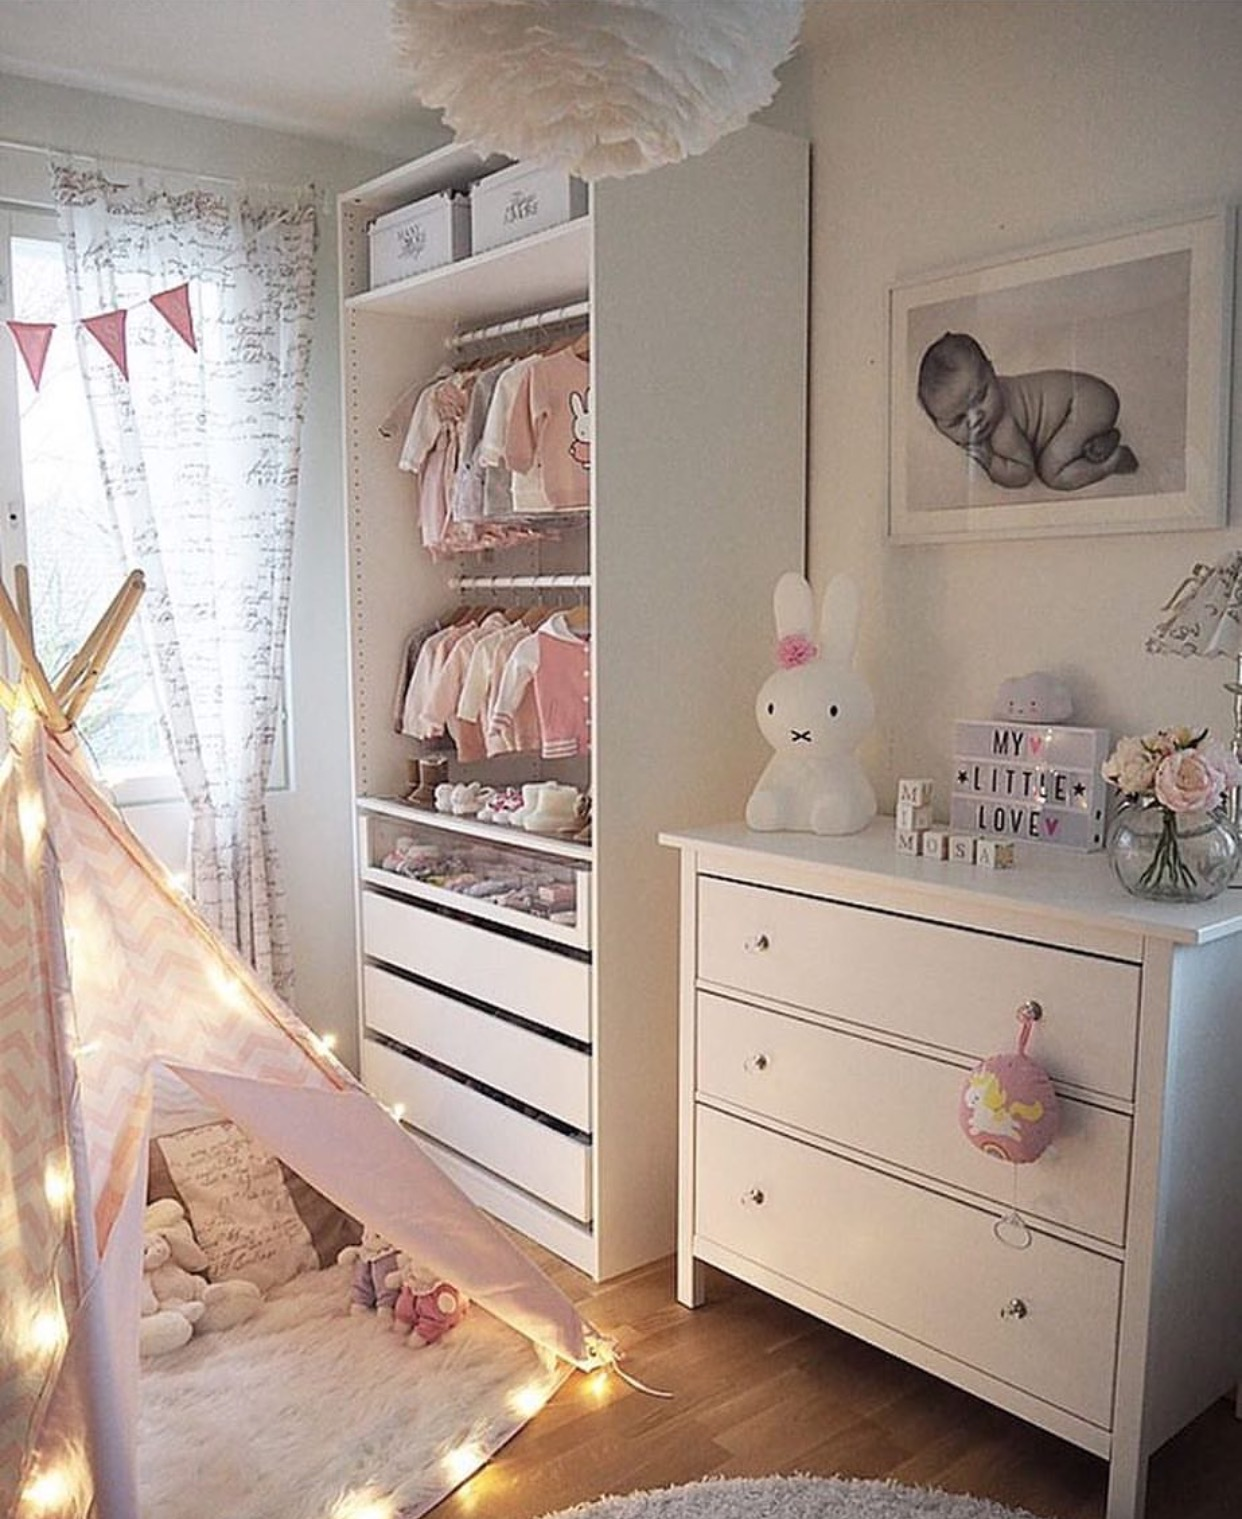 pax ikea 46. Black Bedroom Furniture Sets. Home Design Ideas